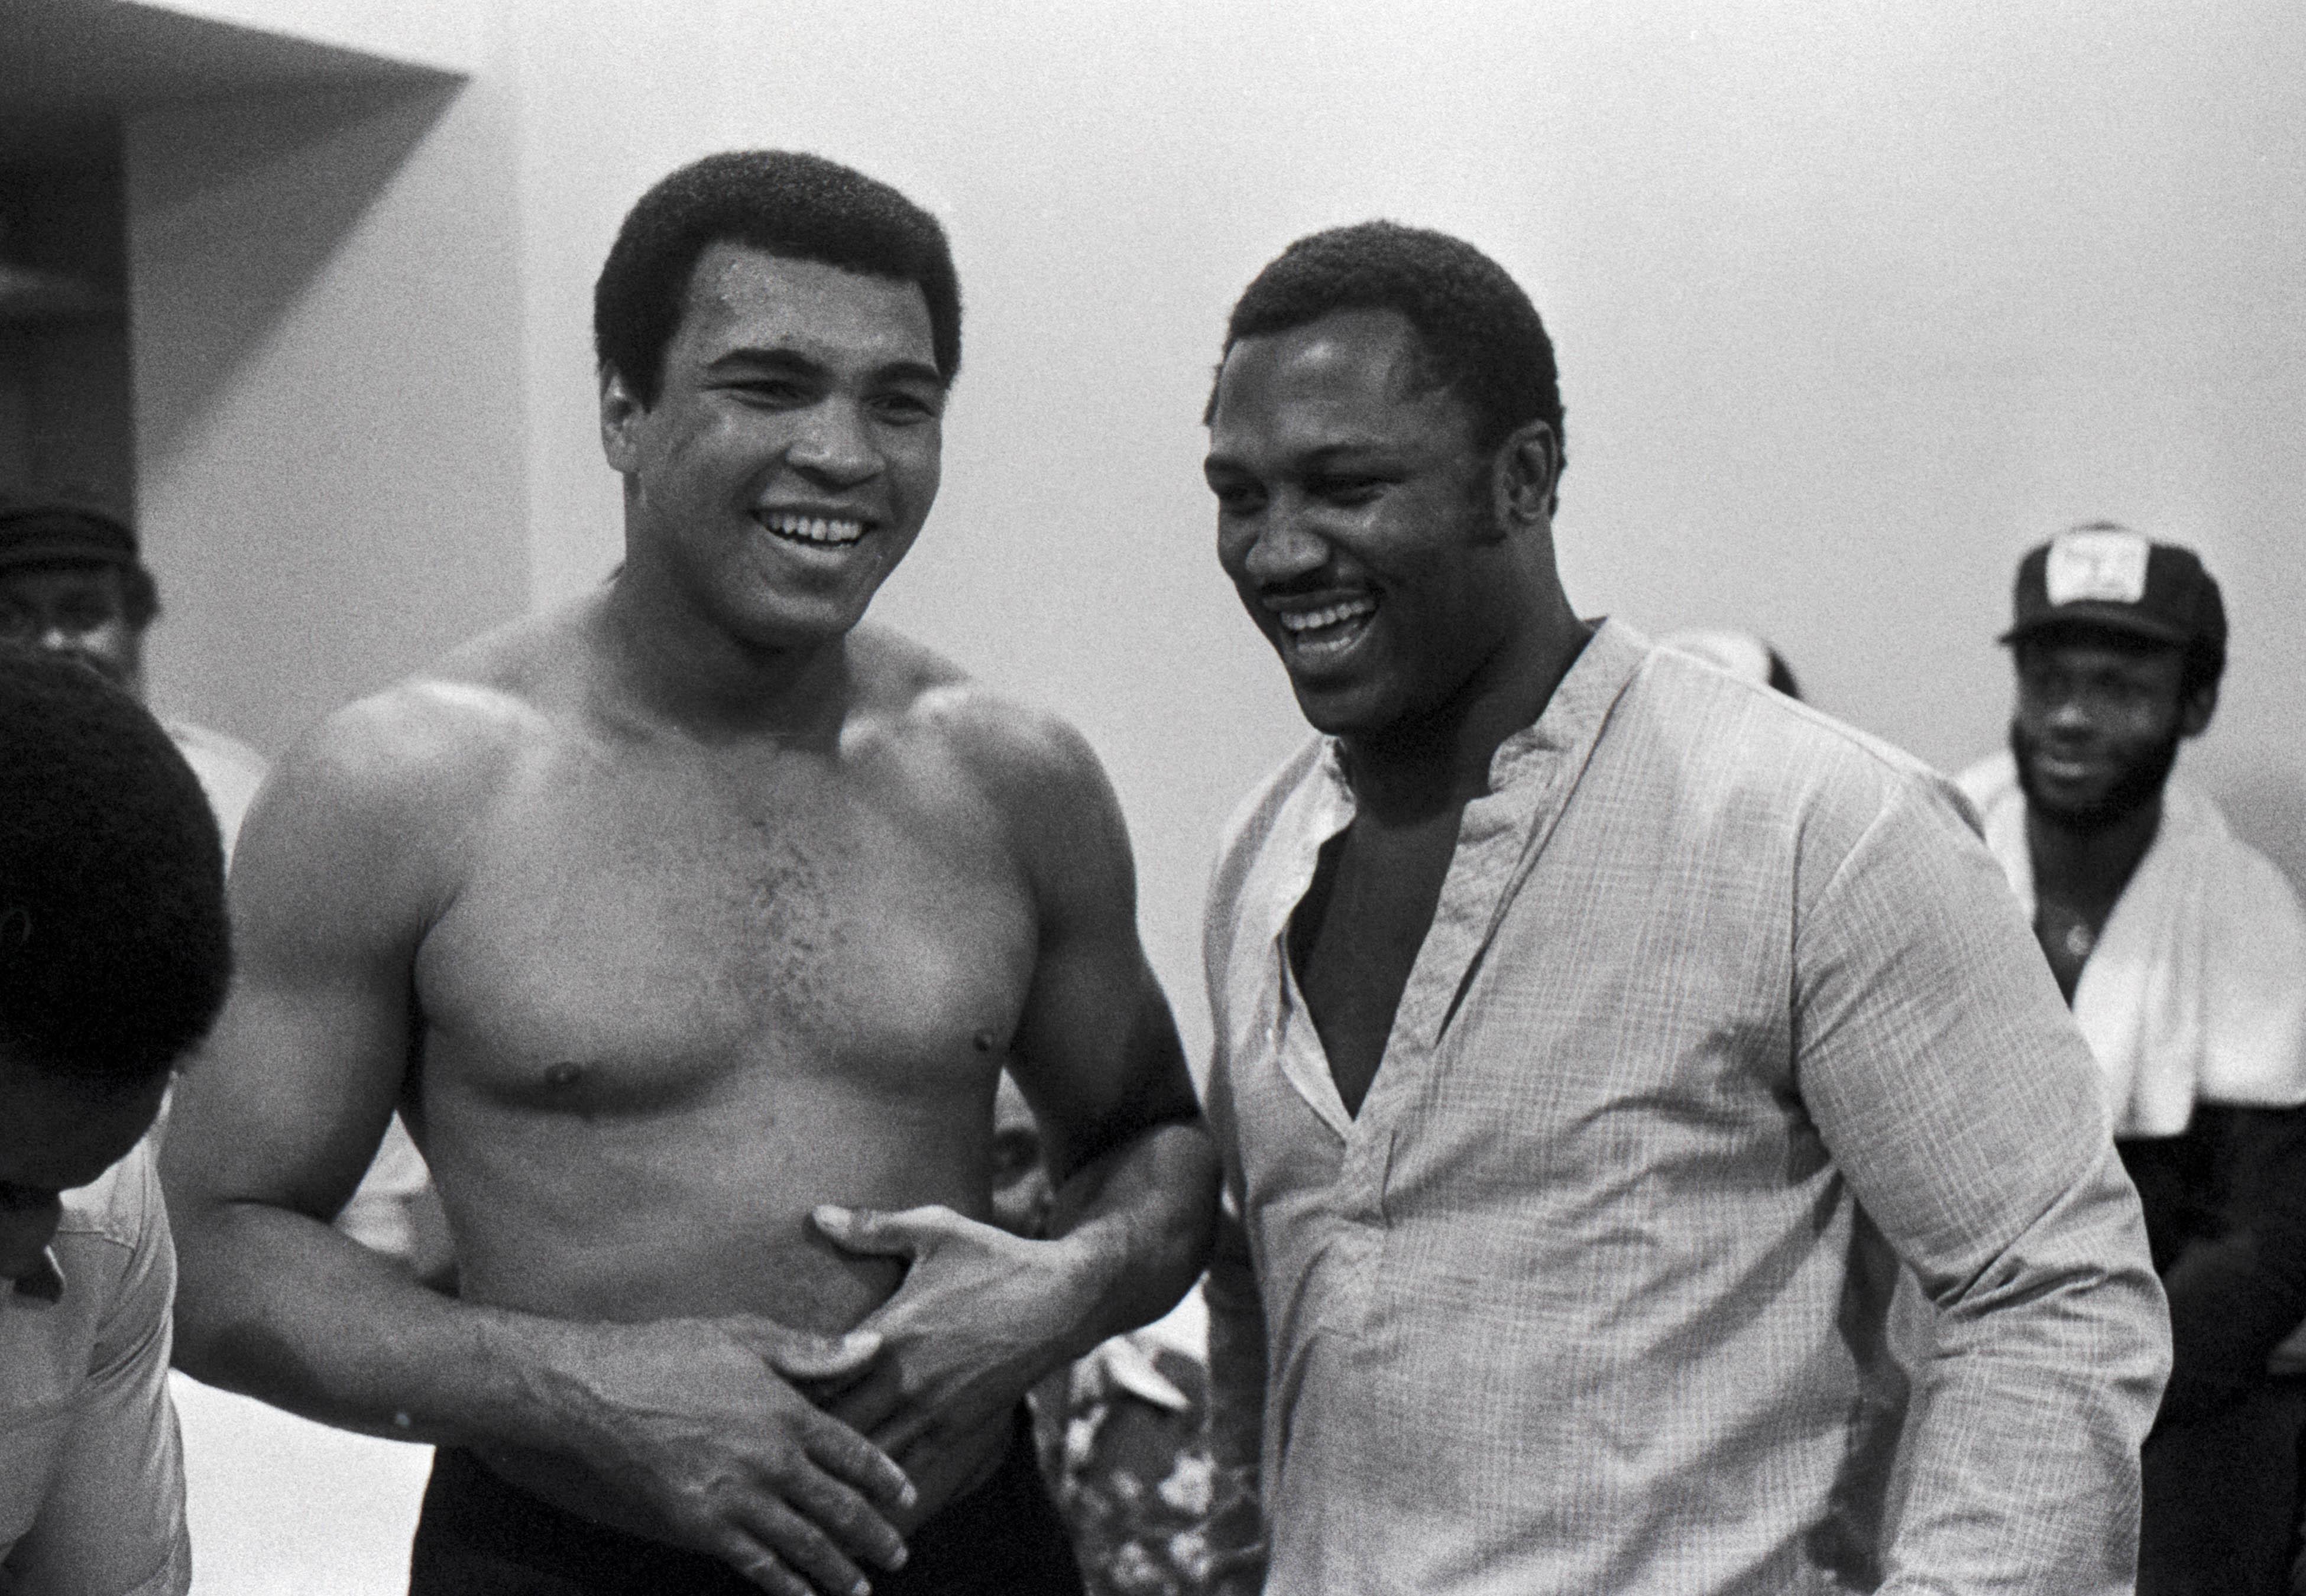 Muhammad Ali and Joe Frazier share a Husky joke